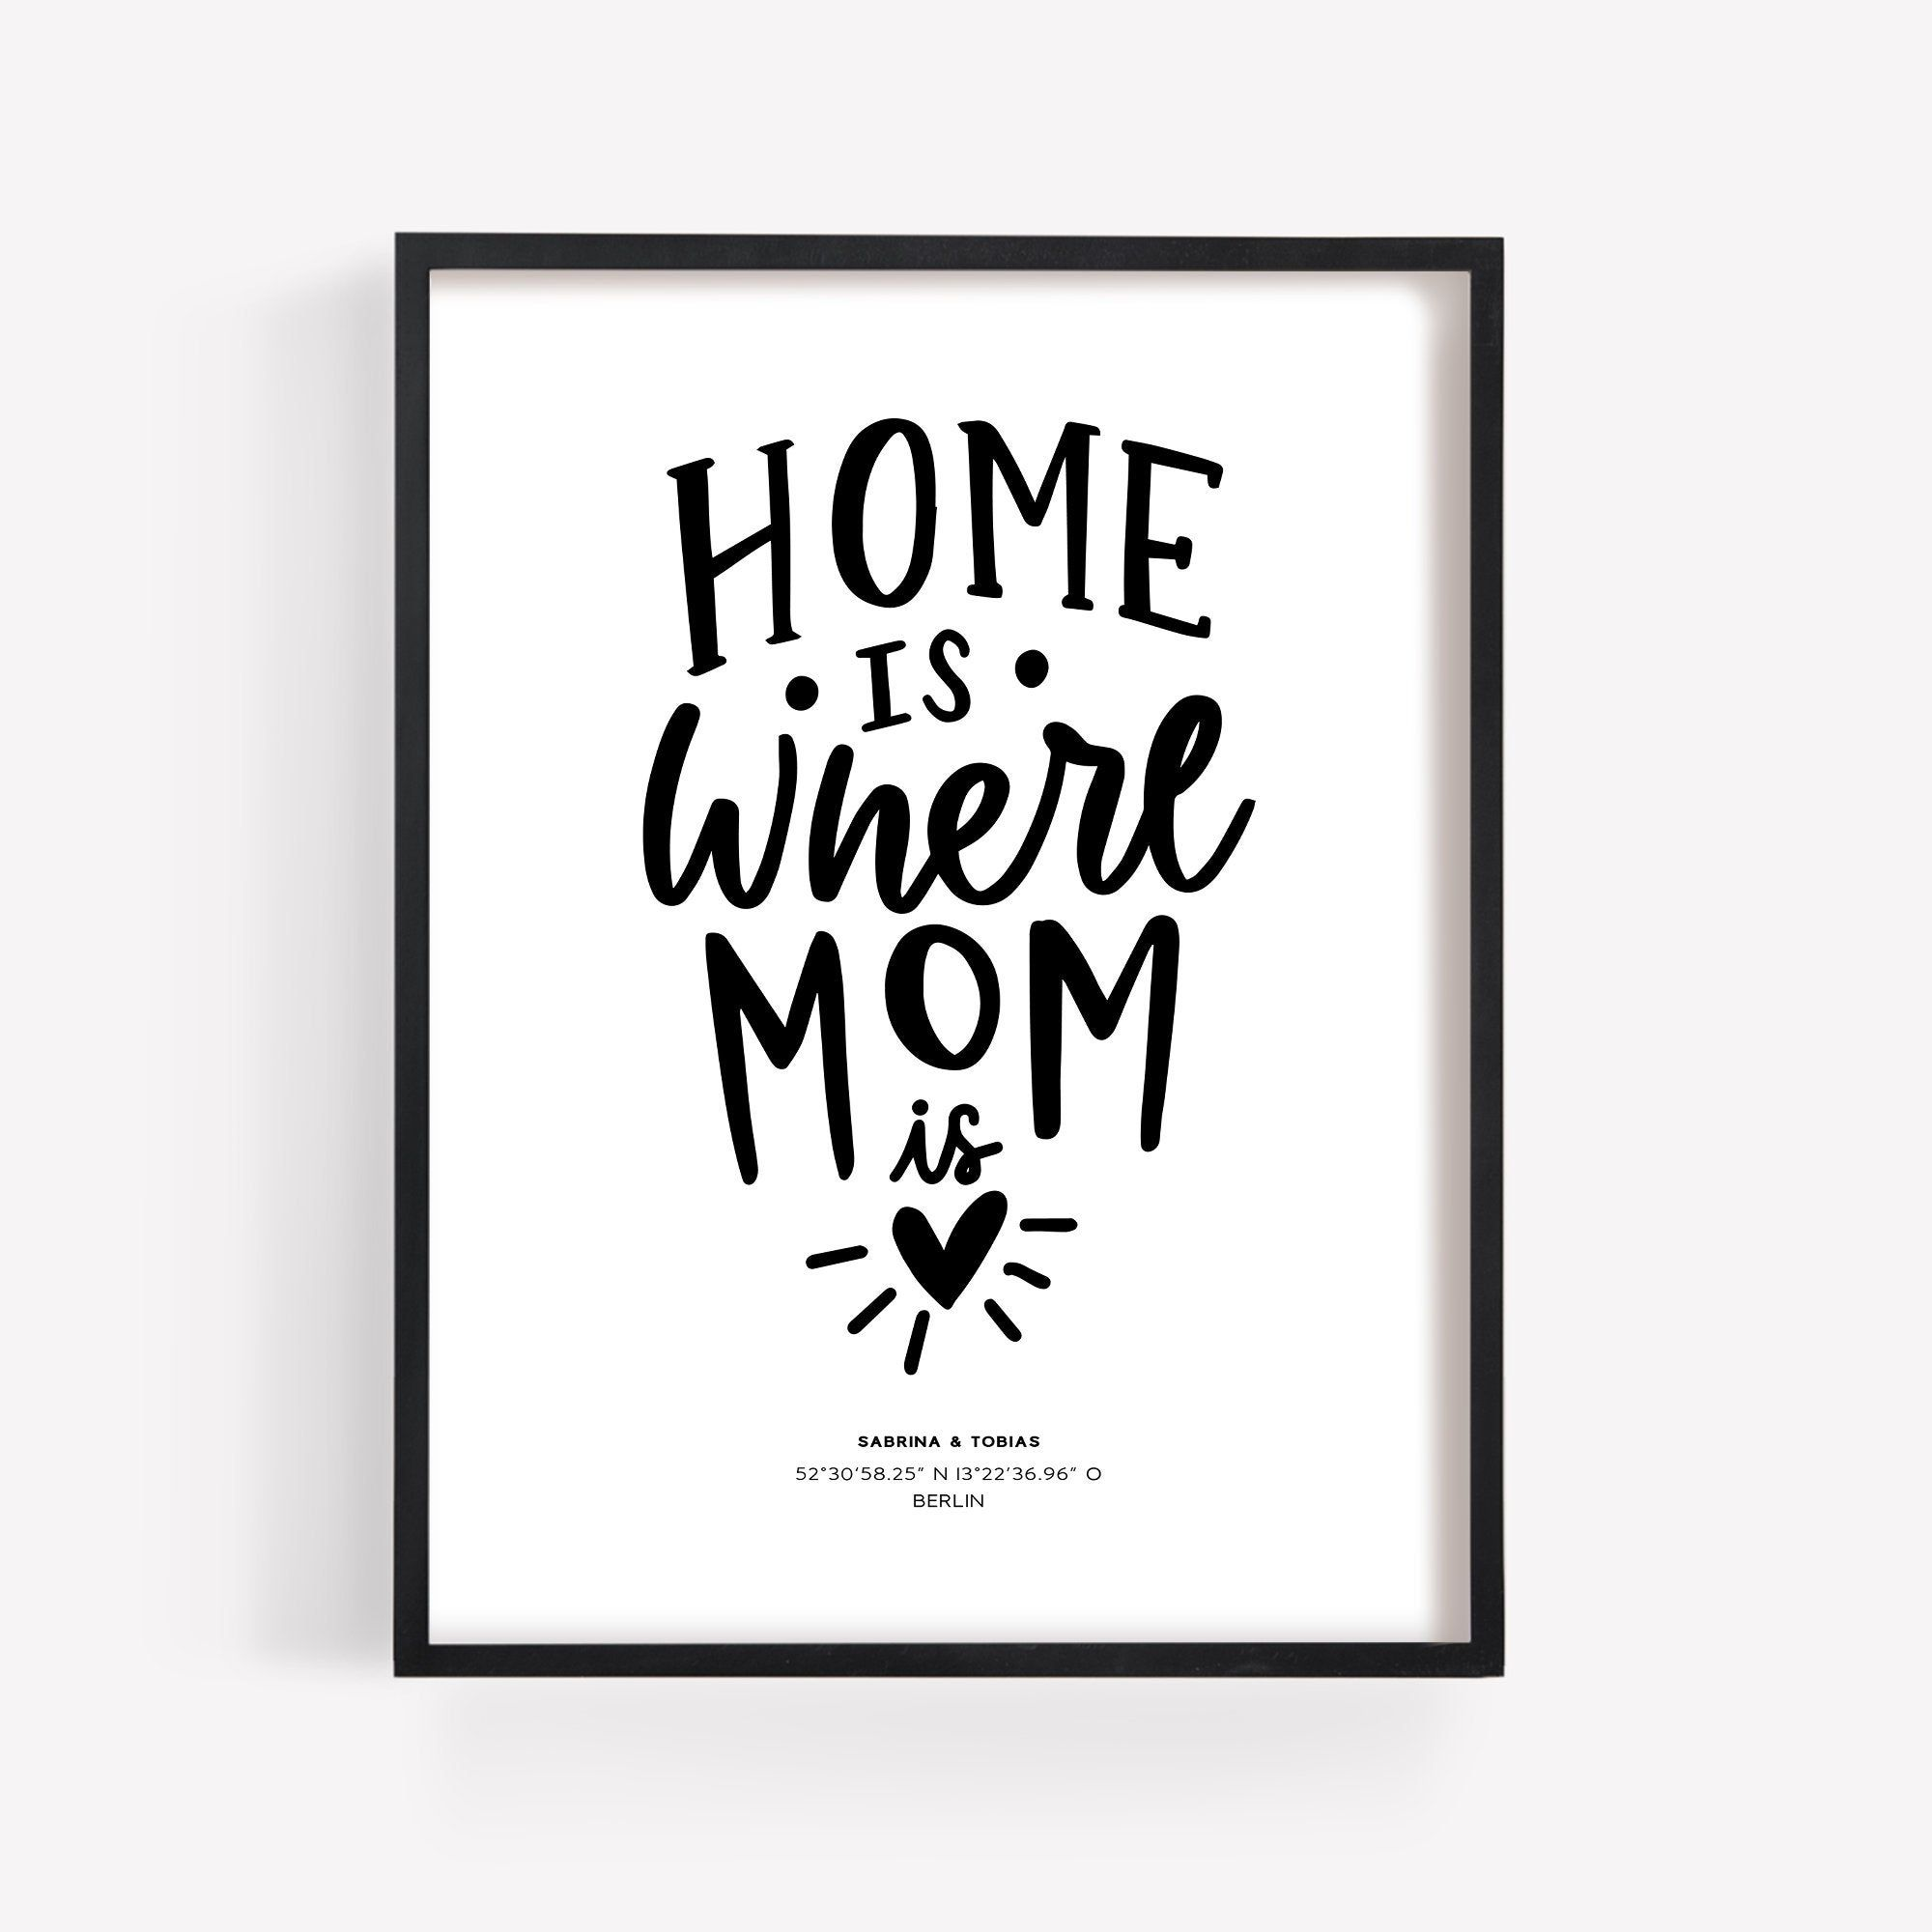 Poster Home Is Where Mom Is Mutter Muttertagsgeschenk Geburtstag Muttertag Geschenk Bild Personalisiert Name Mama Individuell Spruch In 2020 Mom Calm Artwork Novelty Sign